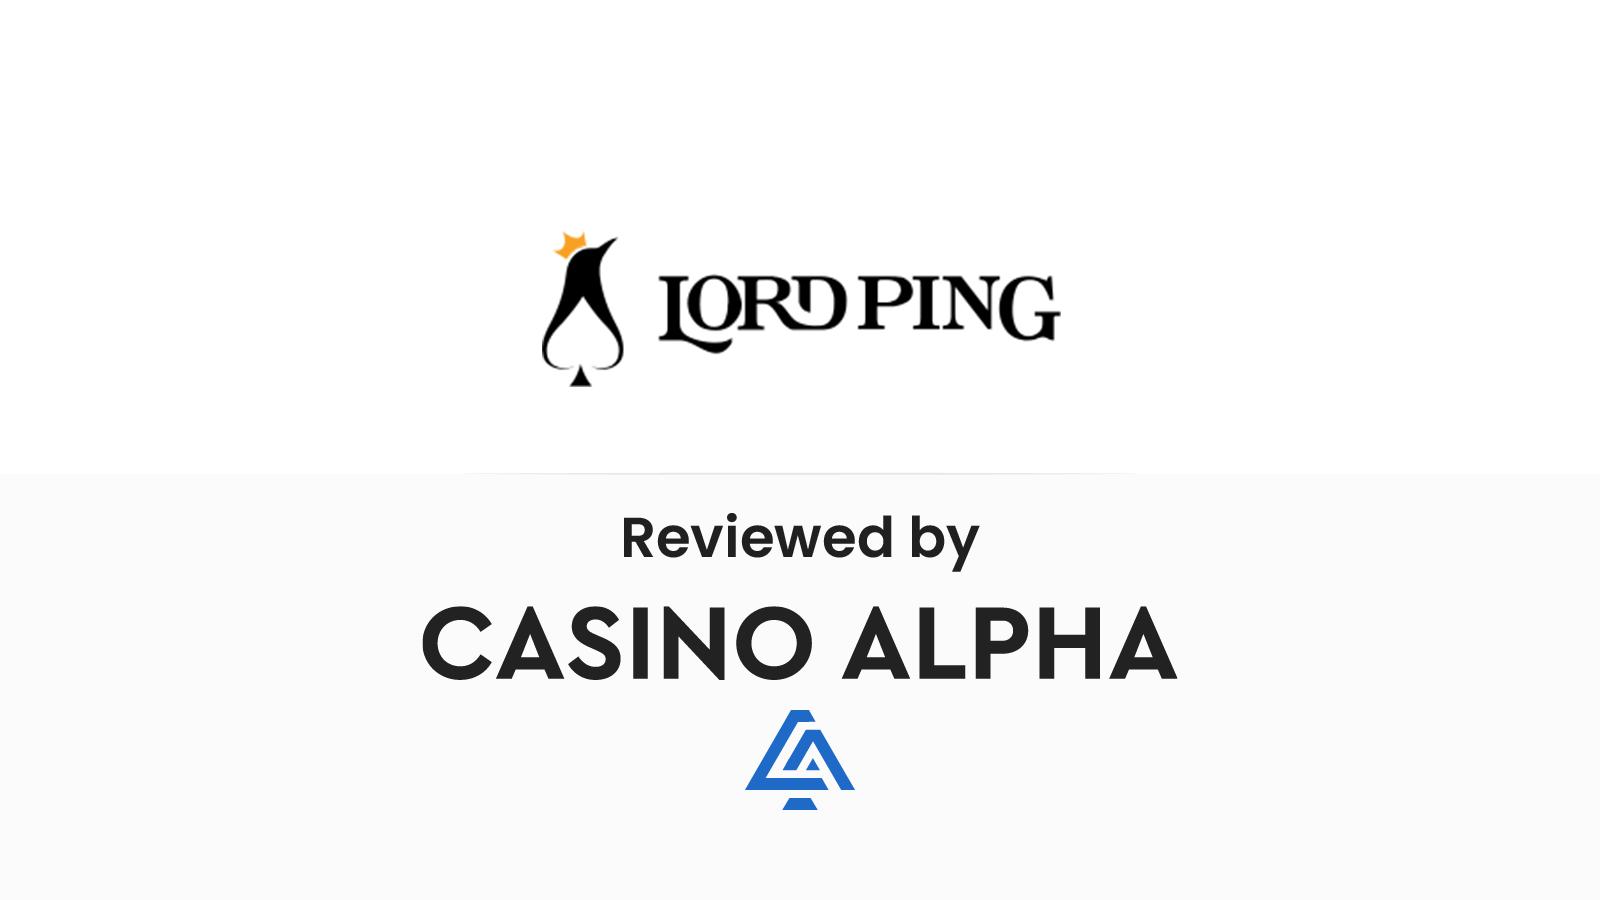 Lord Ping Review & Bonuses